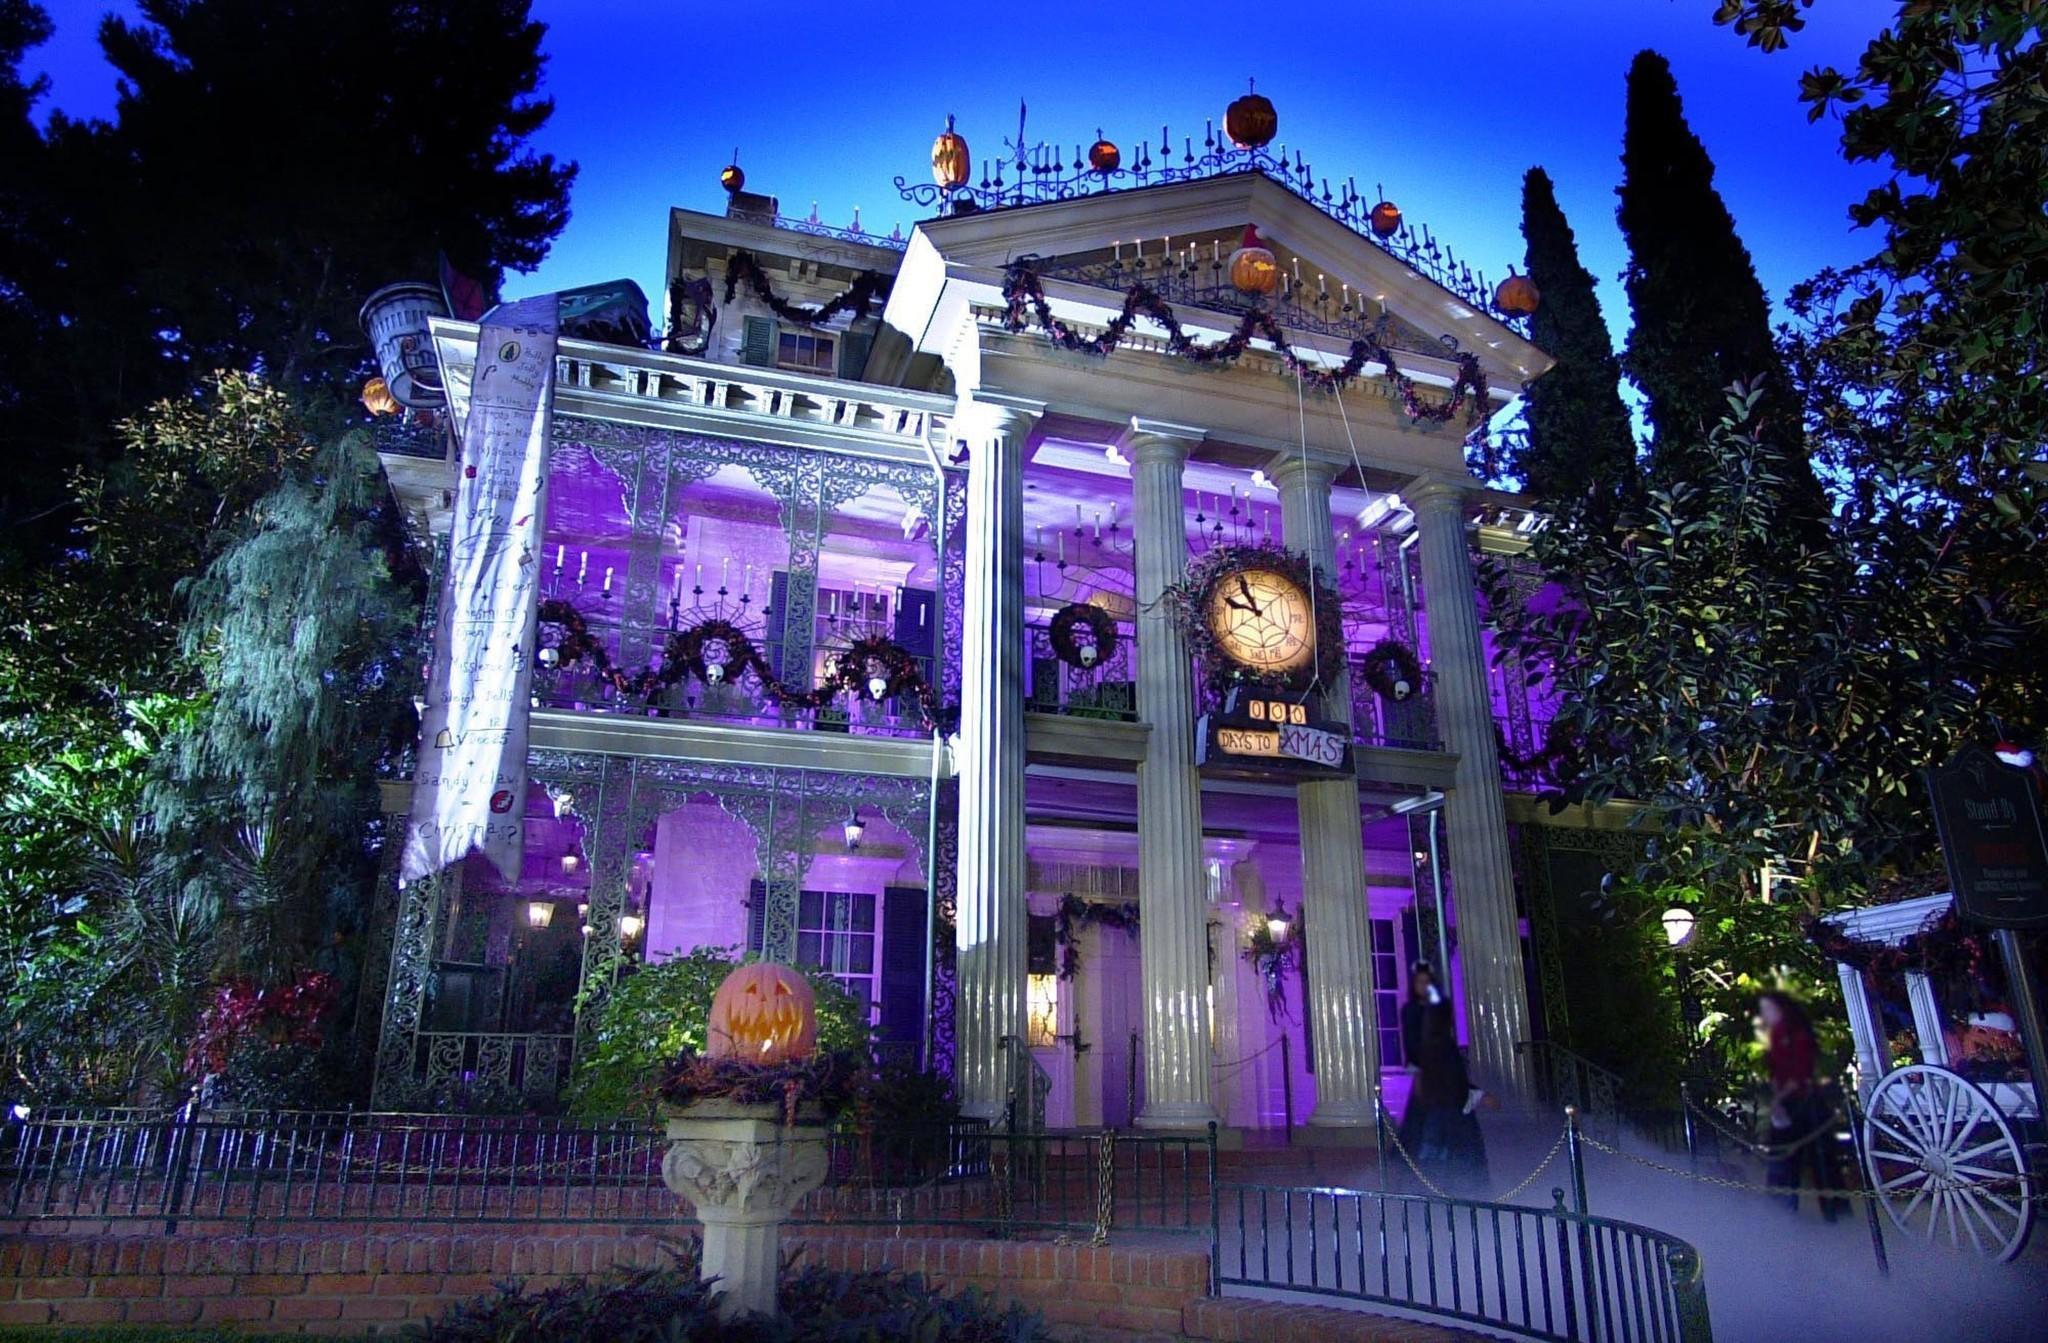 la-et-st-disney-haunted-mansion-animated-special-20140717